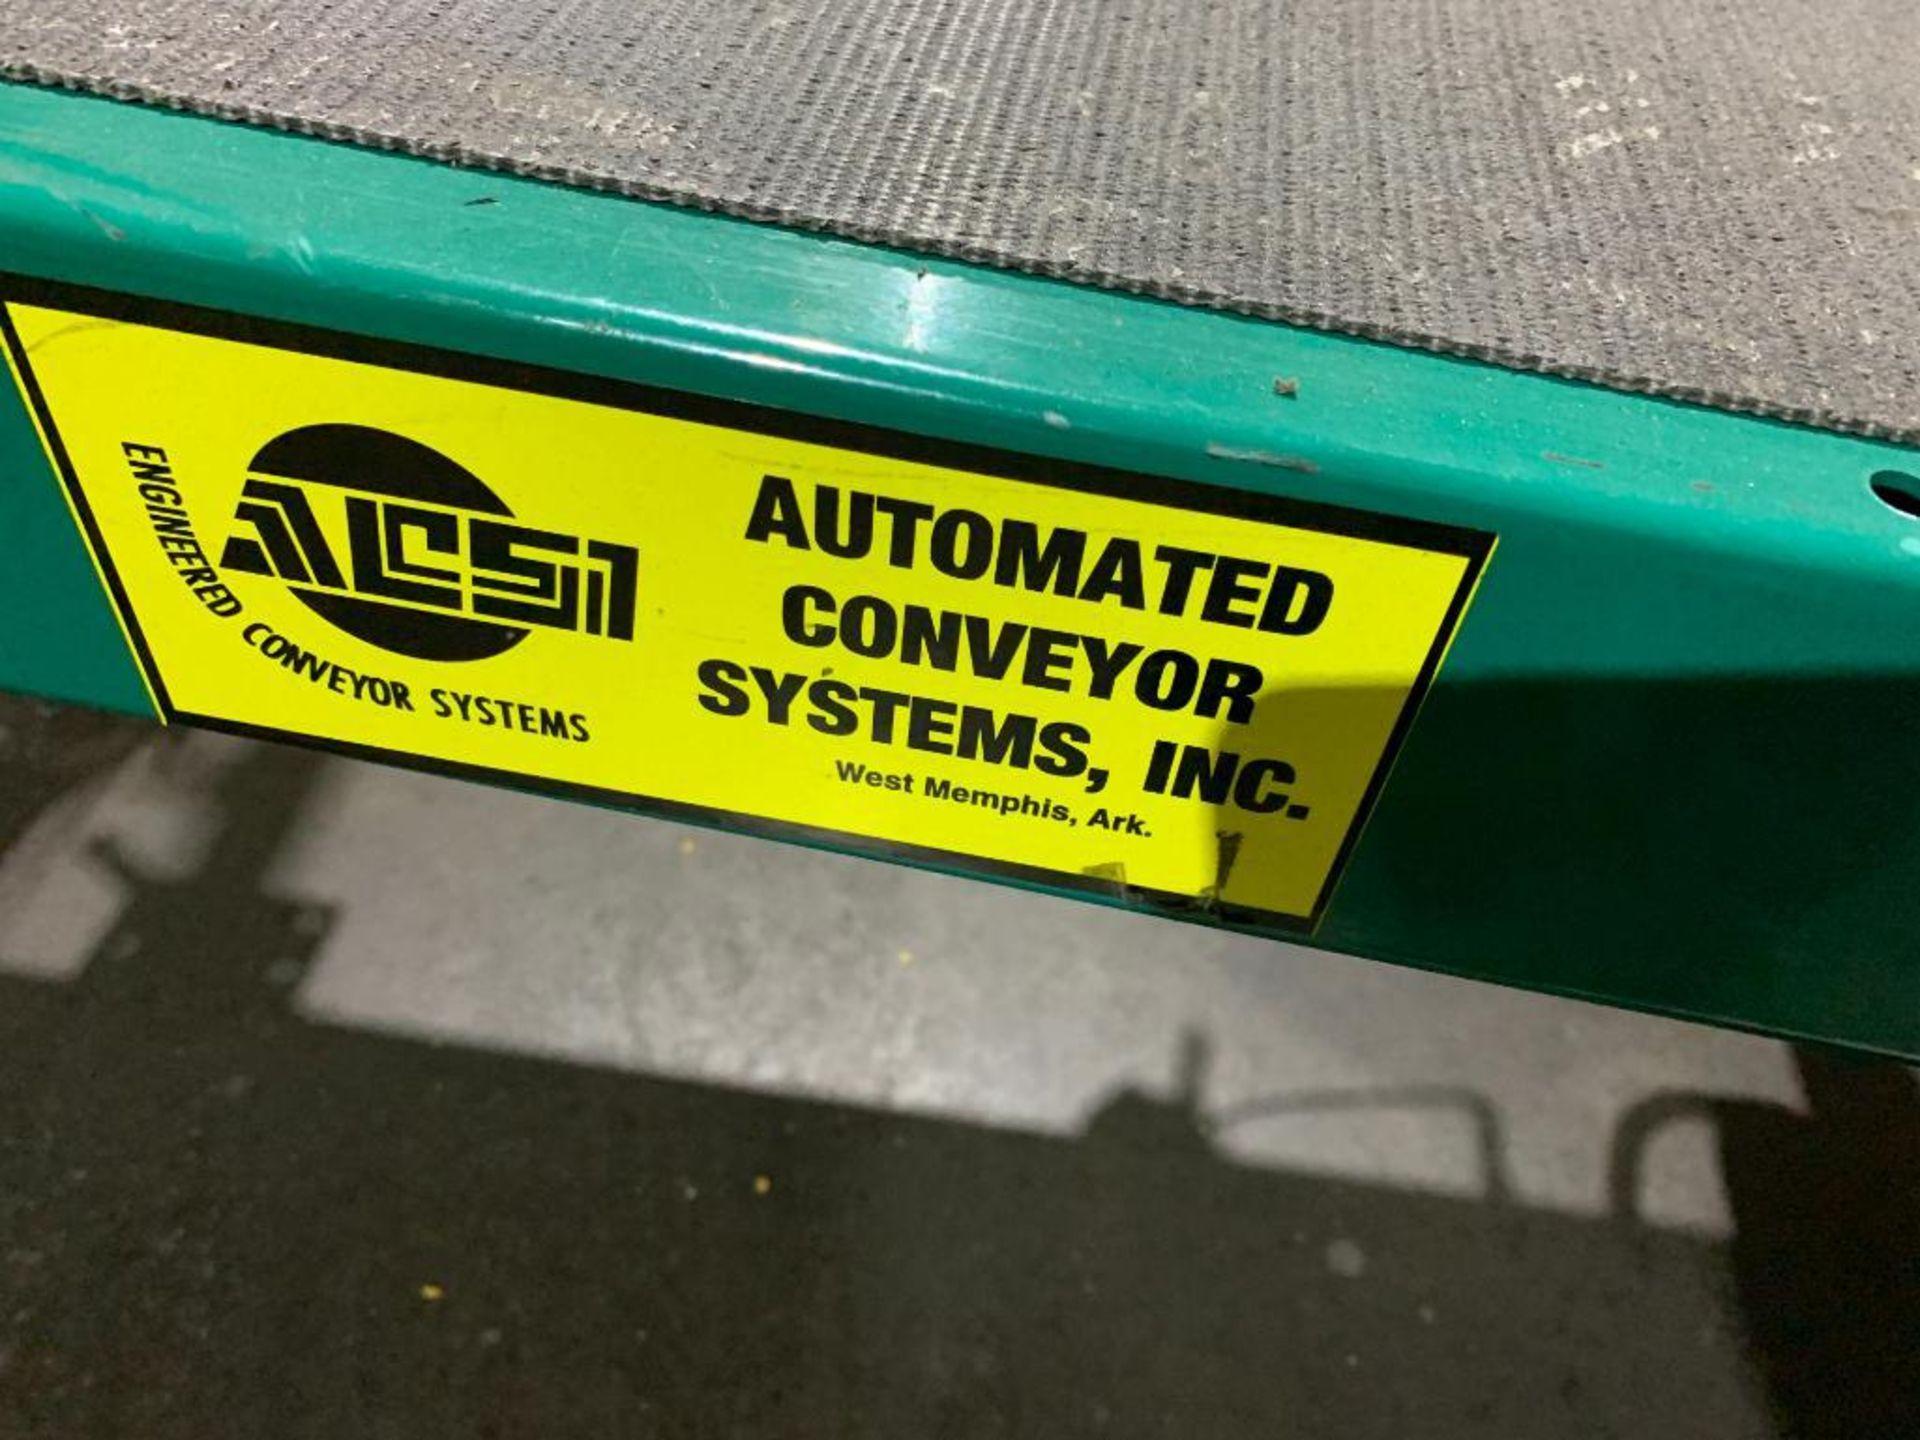 Automated Conveyor Systems mild steel conveyor - Image 2 of 9